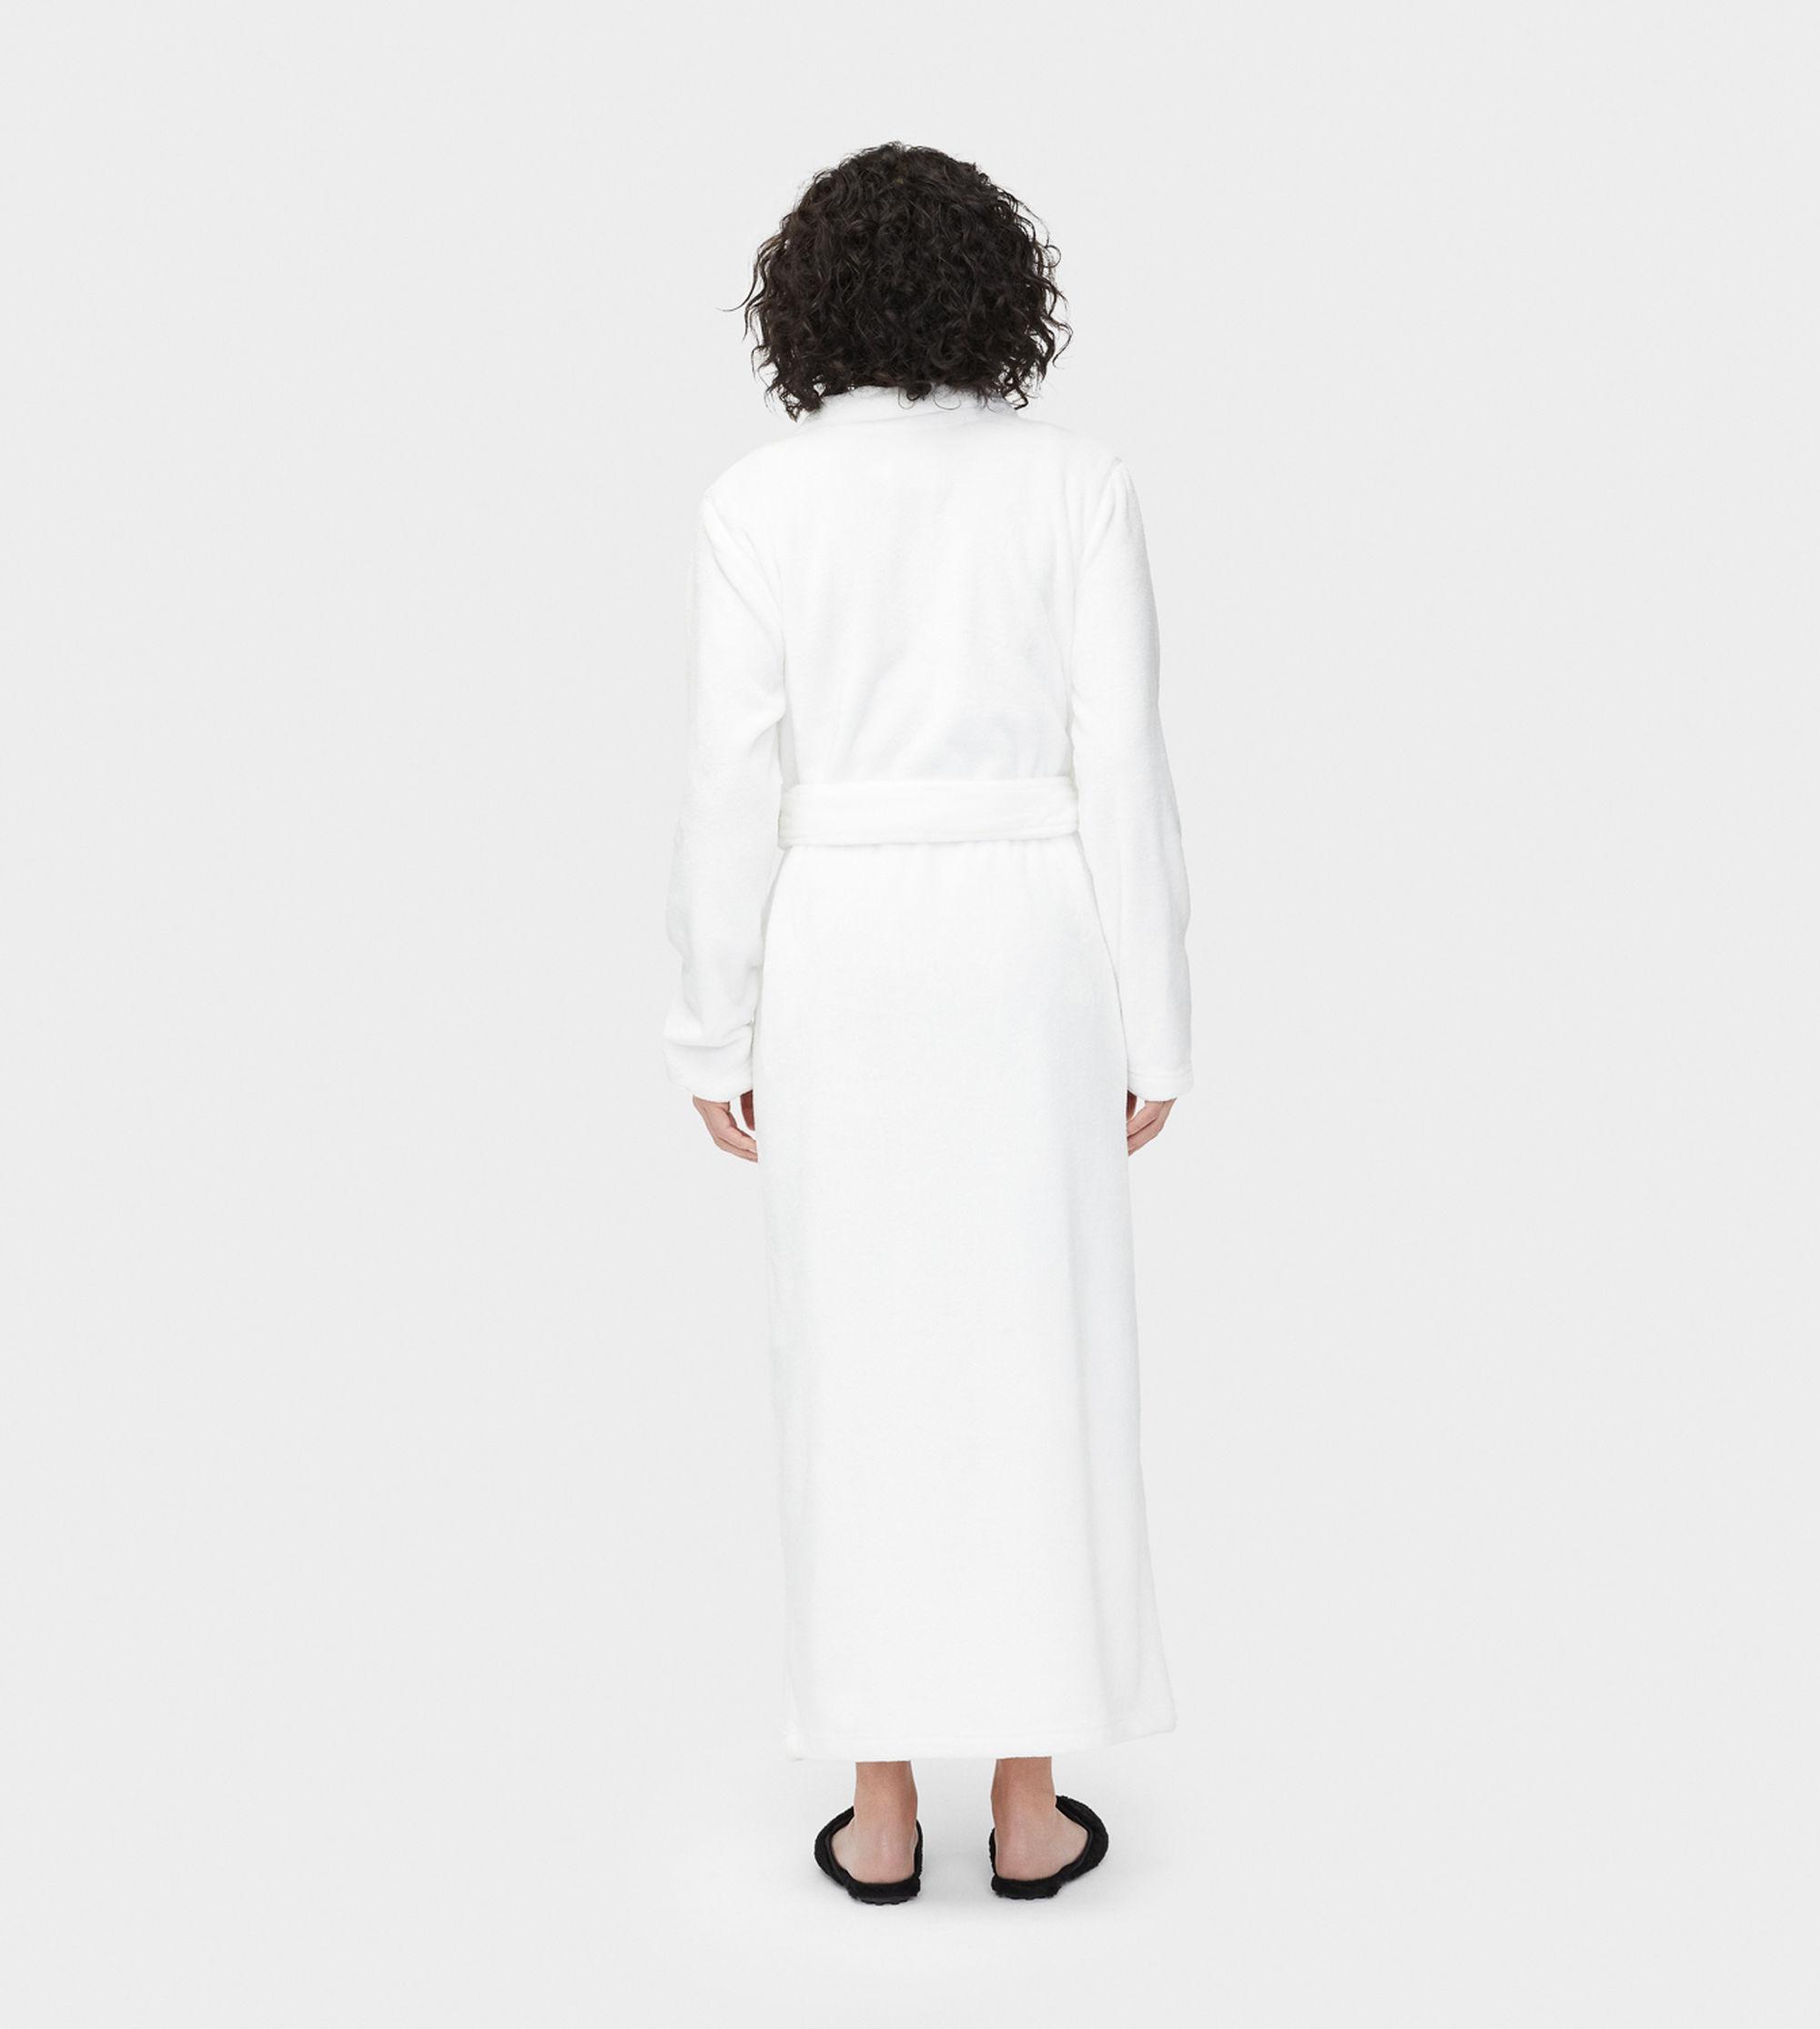 f4086957b0 Lyst - UGG Marlow Robe Marlow Robe in White